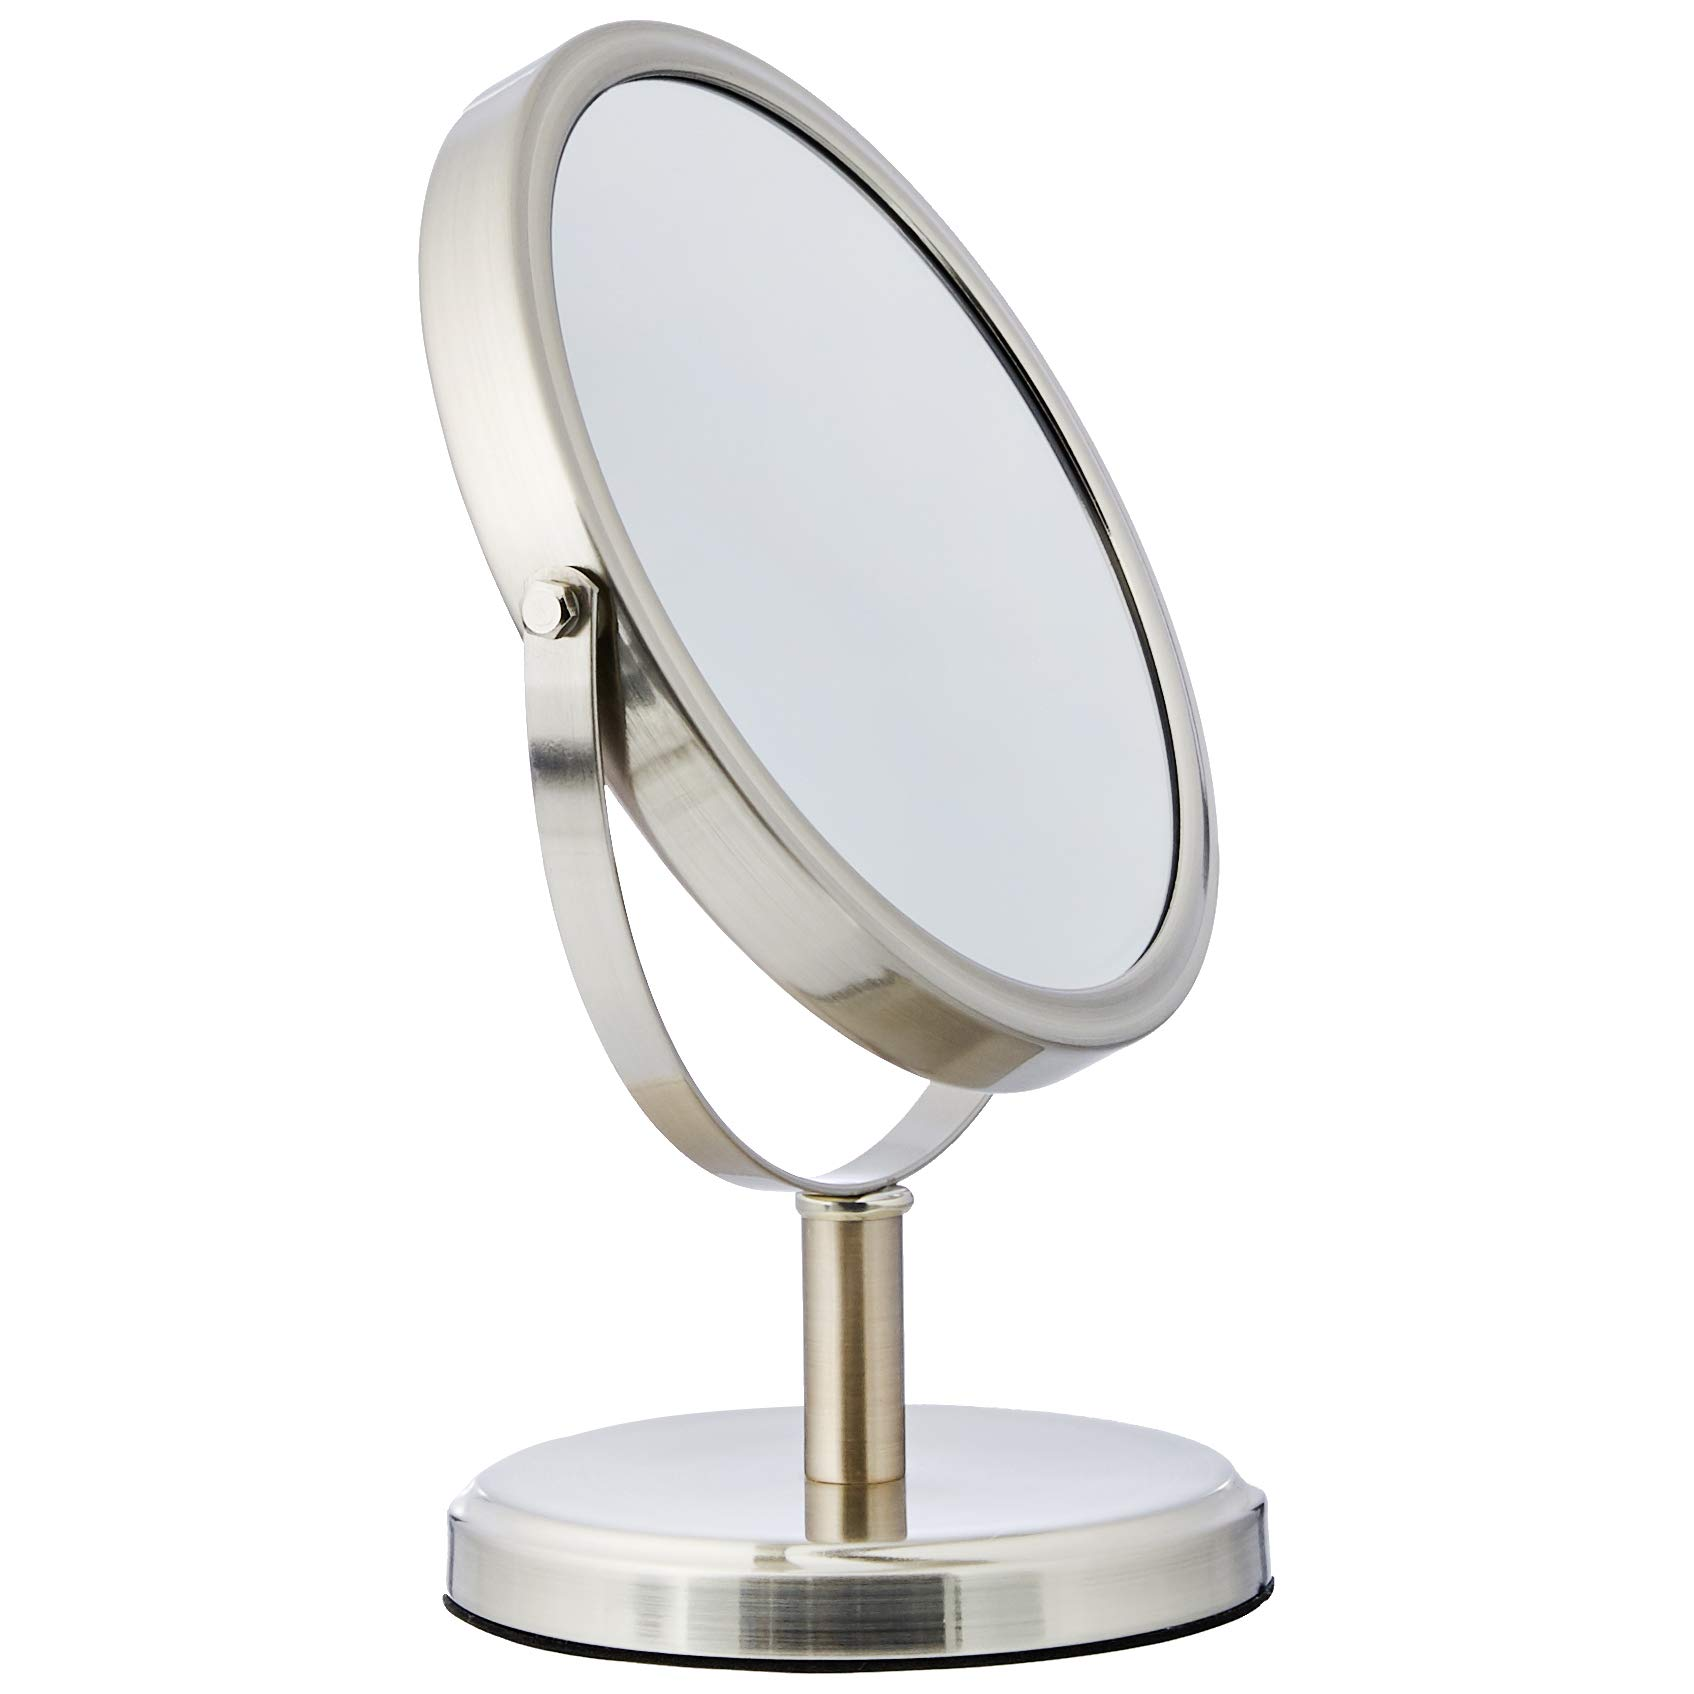 AmazonBasics Modern Dual Sided Magnification Makeup Vanity Mirror, Standard, Nickel